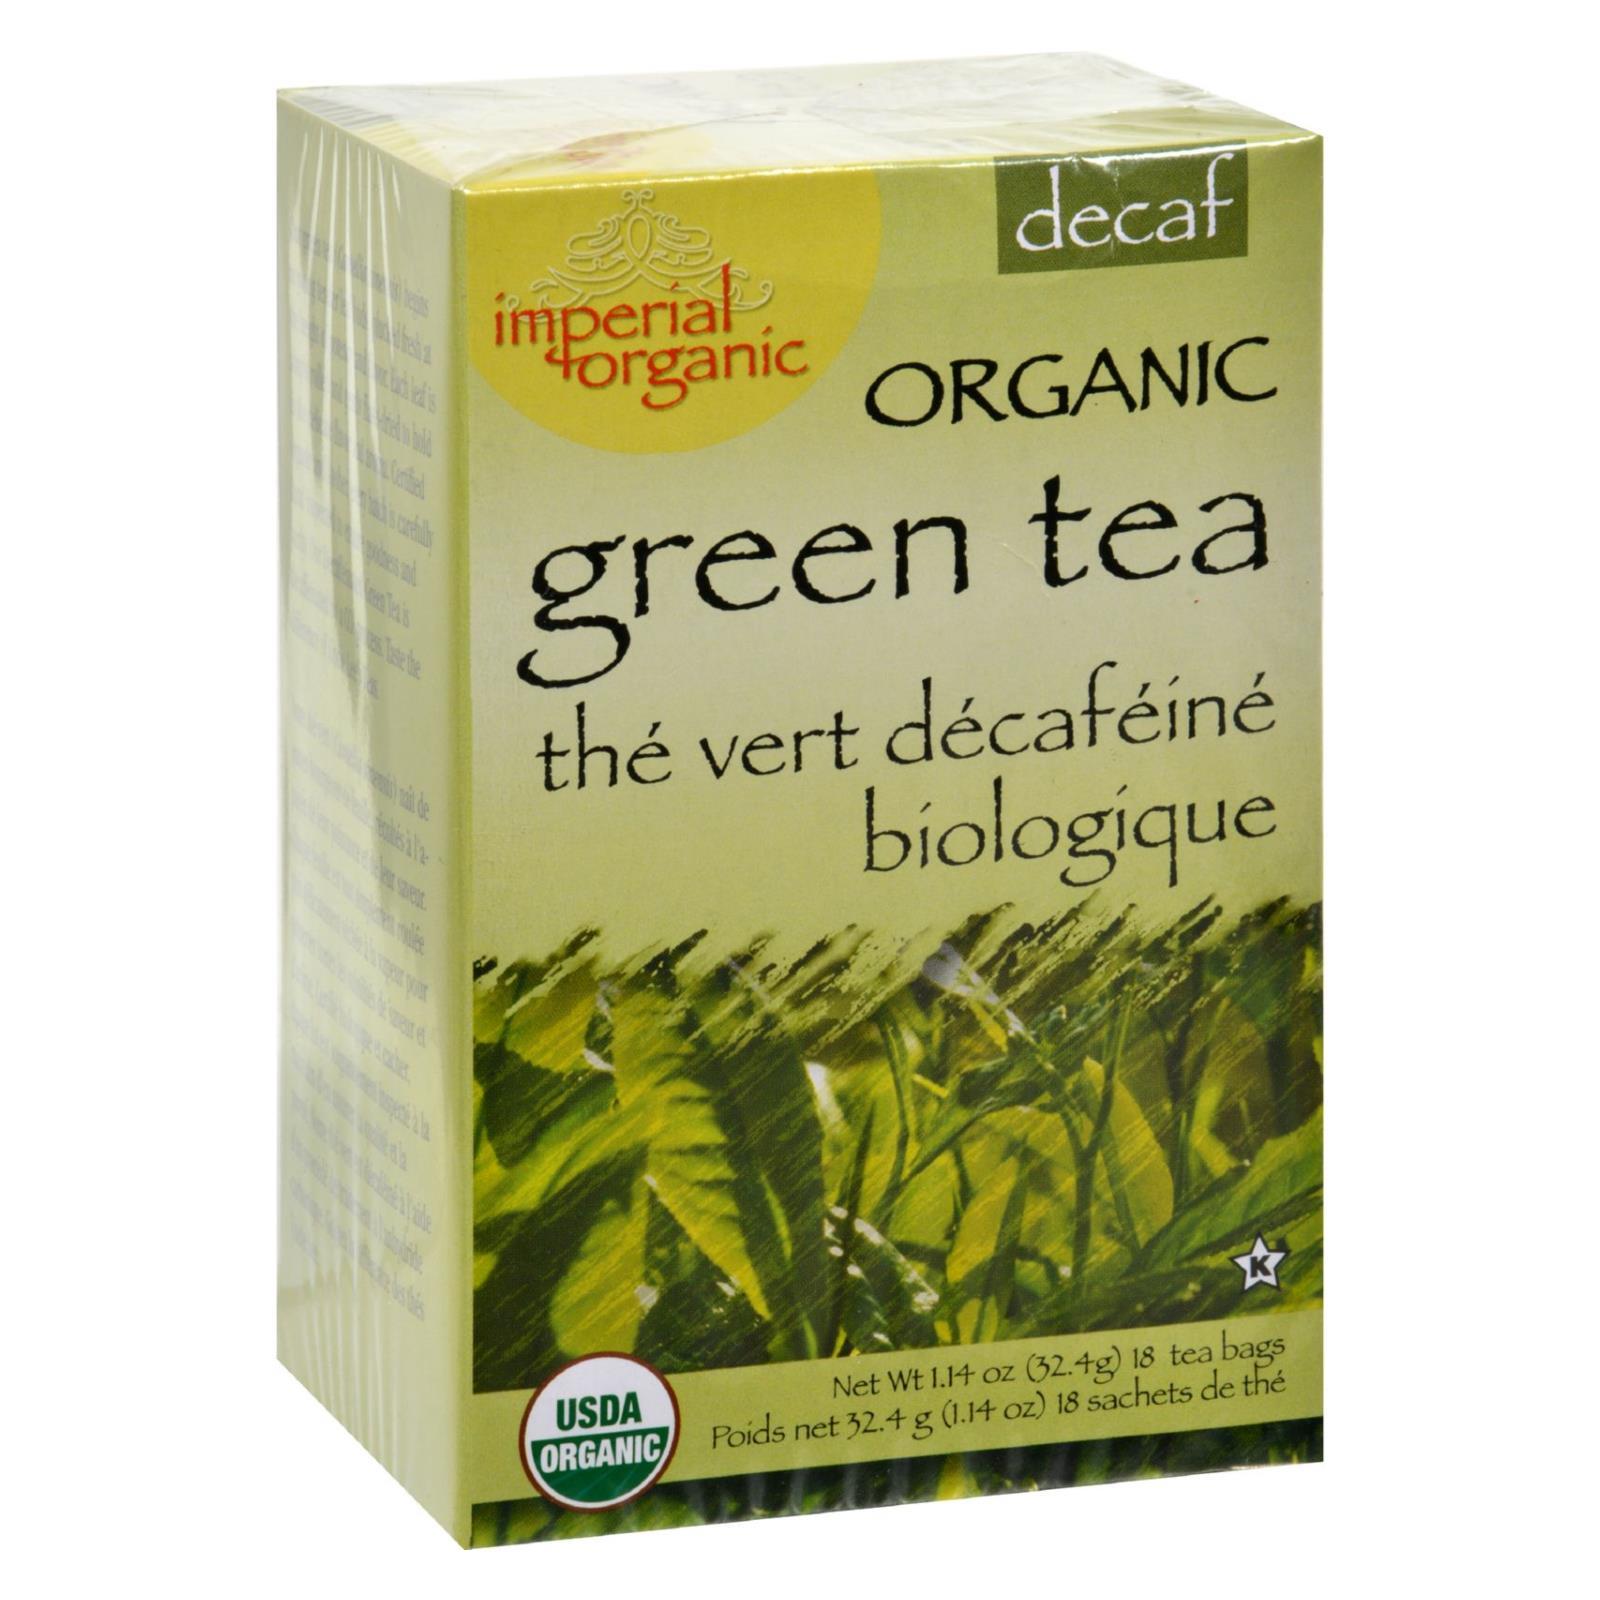 Uncle Lee's Tea Organic Imperial Decaffeinated Green Tea - 18 Bags